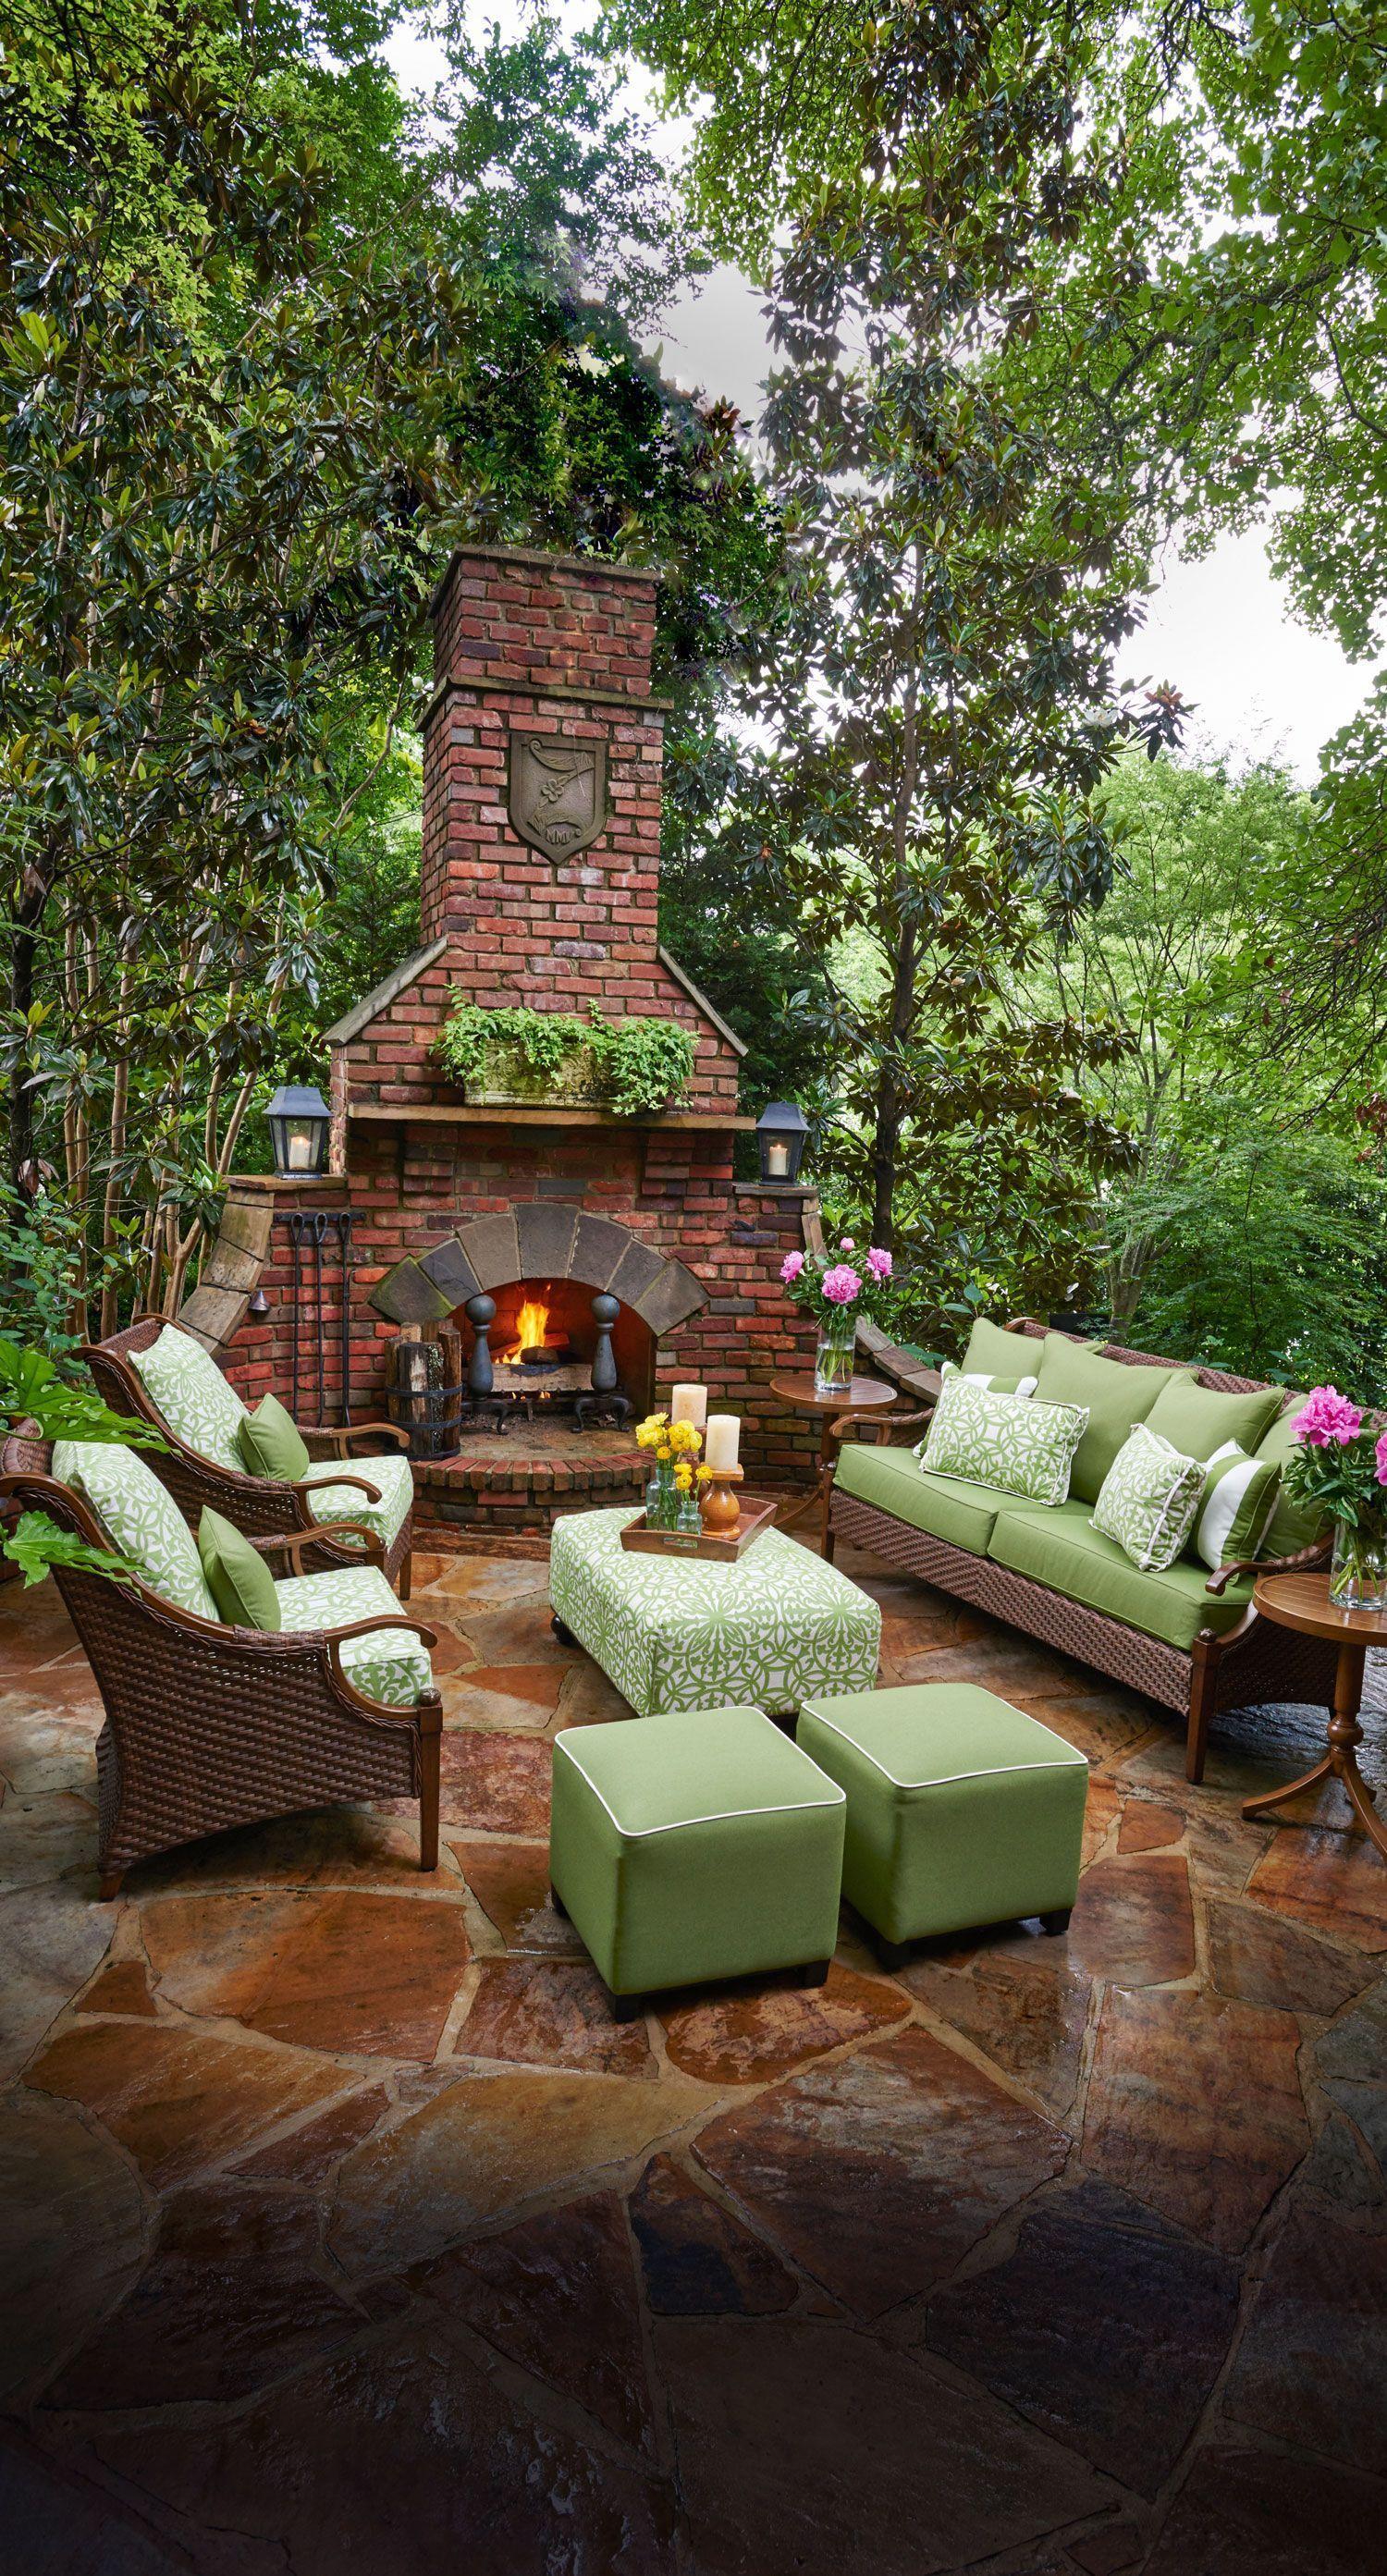 7 Outdoor Kitchen Ideas For The Best Summer Yet Rustic Outdoor Fireplaces Outdoor Fireplace Designs Backyard